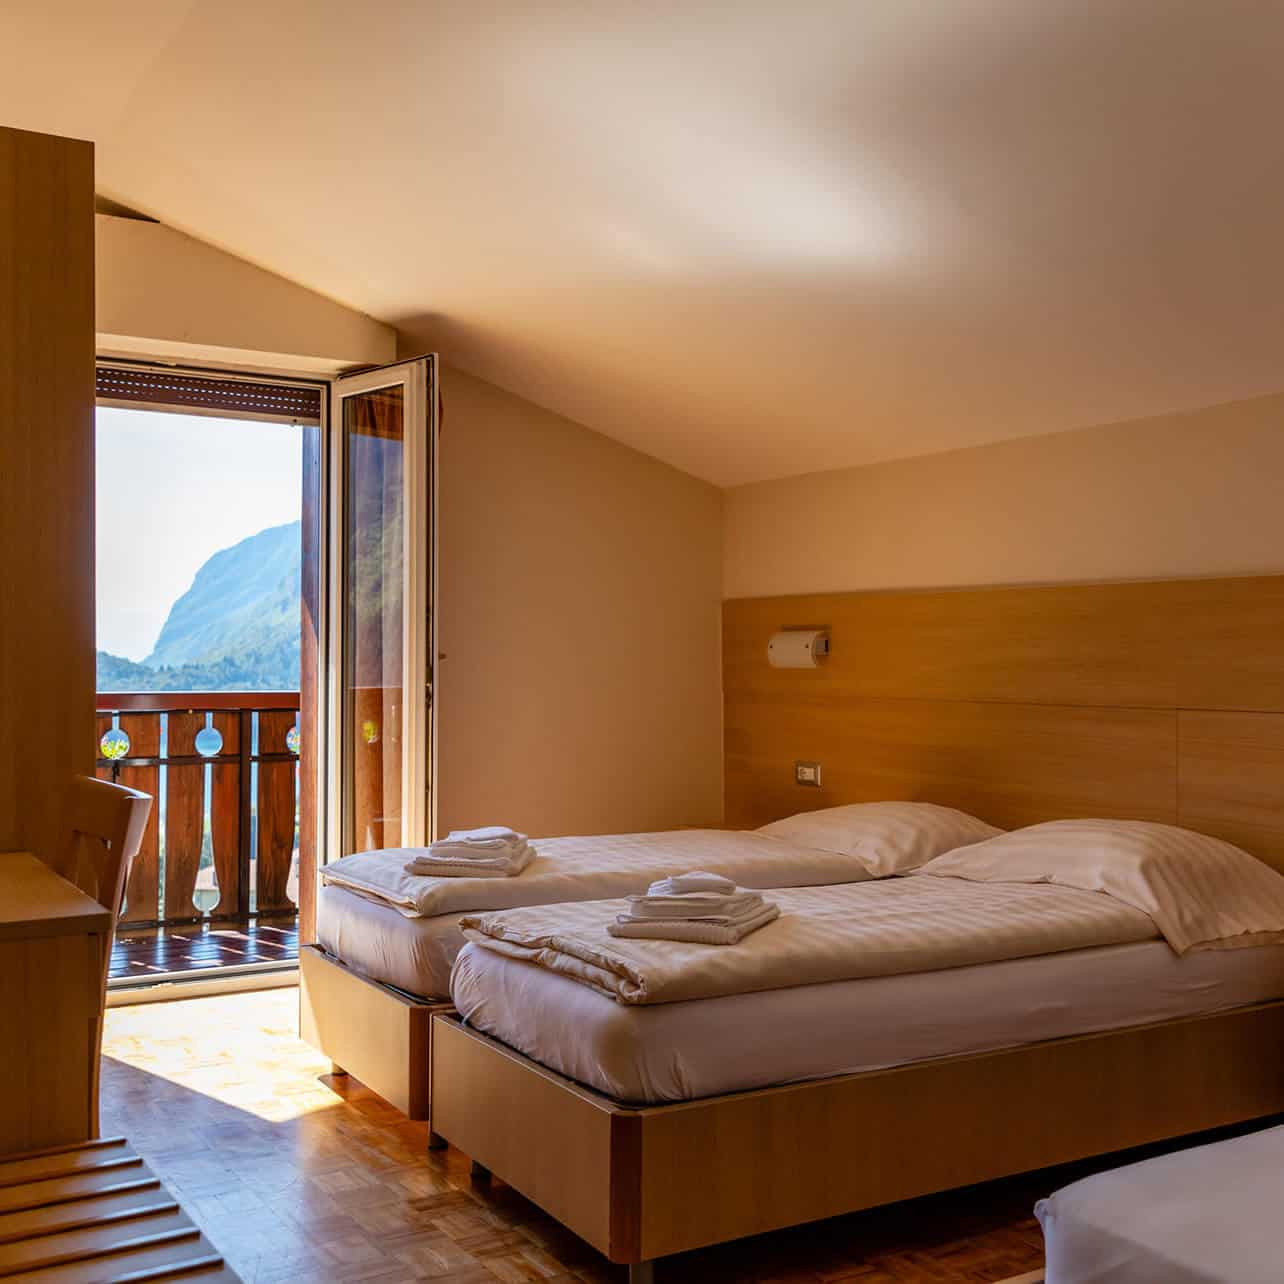 familiengeführtes Hotel Dolomiten